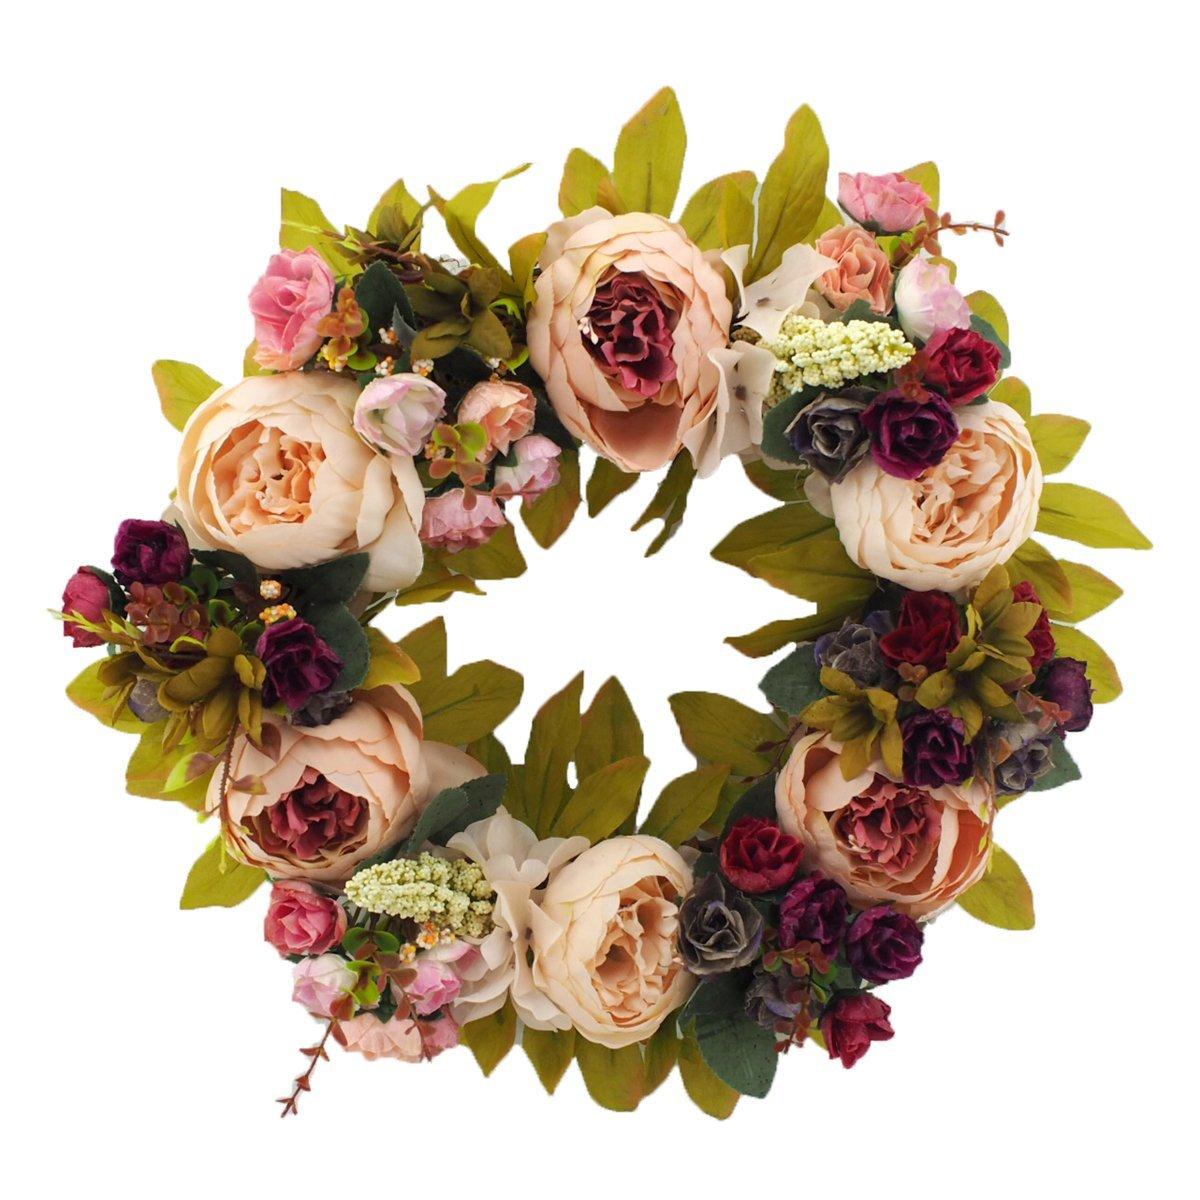 Handmade Flower Wreath - $33.99